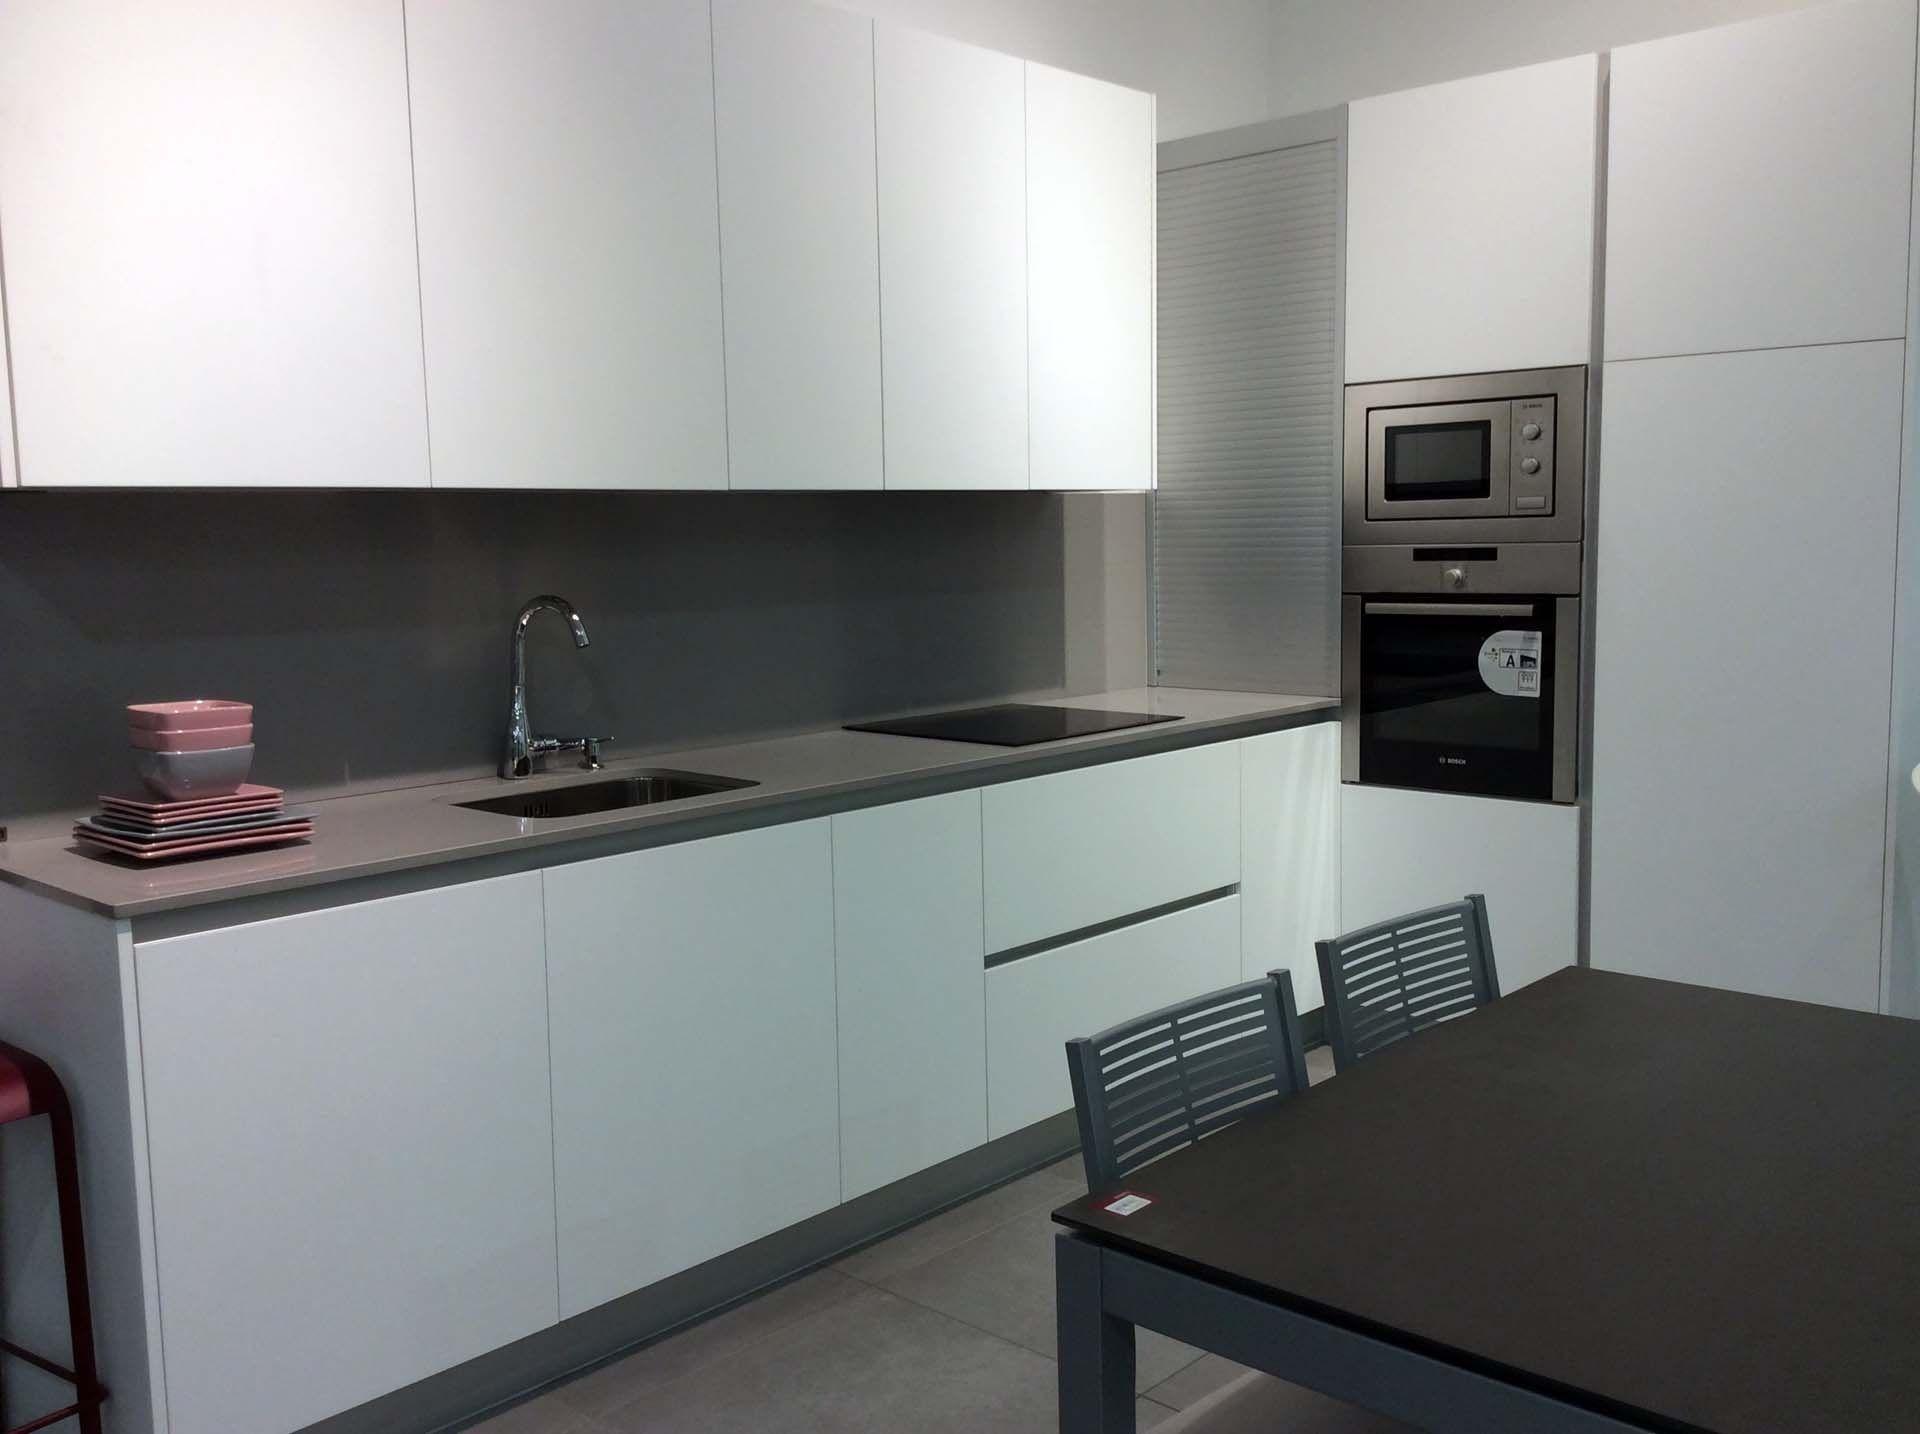 Cocina con gola moderna y completa cocina con gola en for Cocina equipada negro y gris